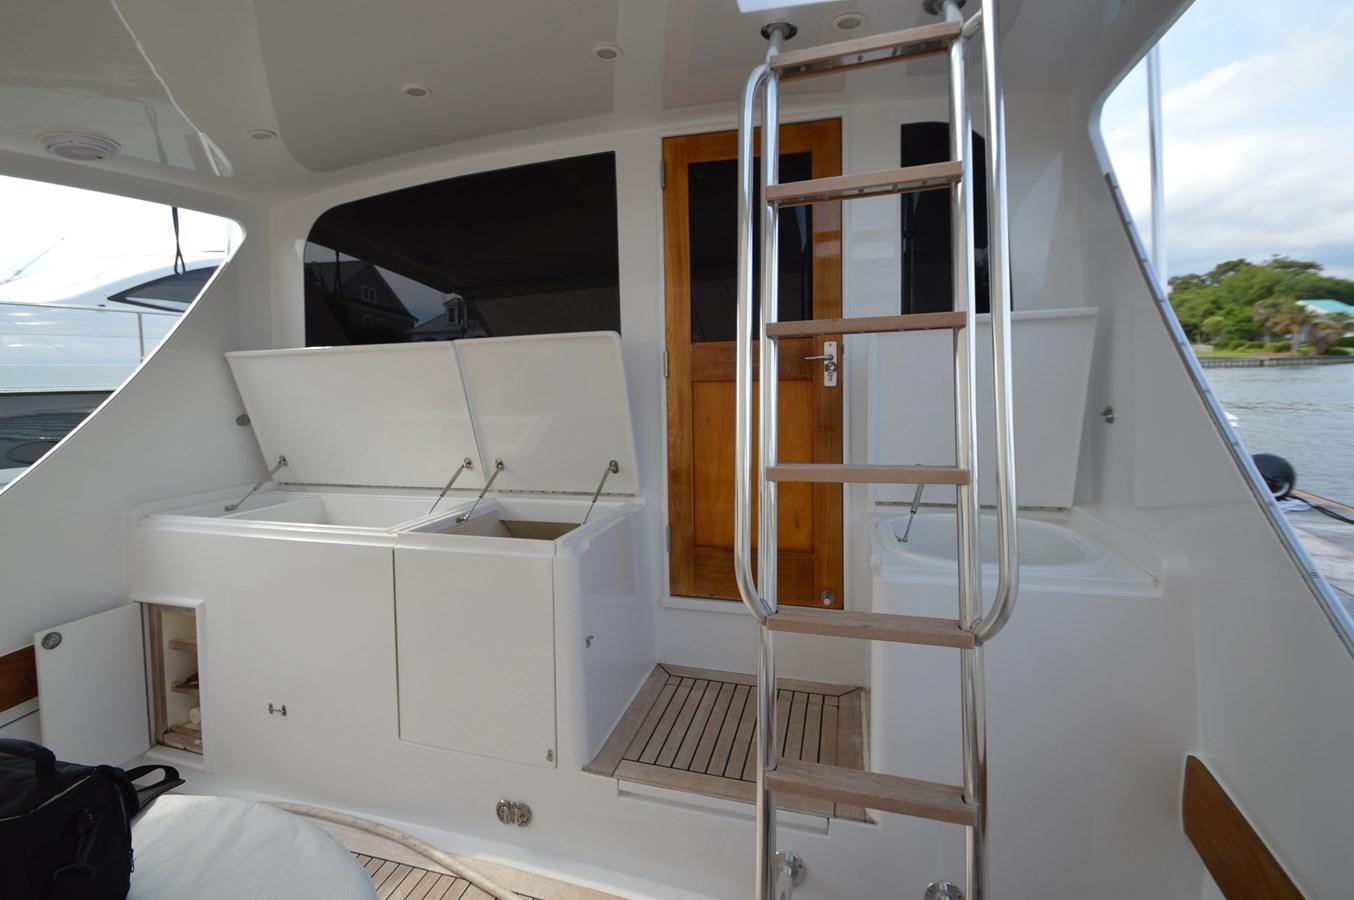 Cockpit - 58 BUDDY DAVIS For Sale